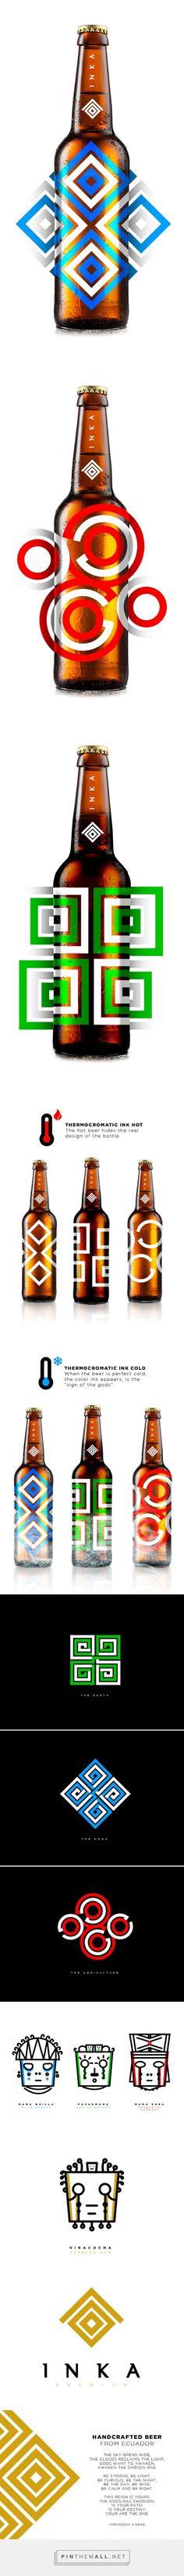 Inka Premium #Beer #packaging by #thermocromatic #ink JP Branding - http://www.packagingoftheworld.com/2015/01/inka-premium-beer-concept.html